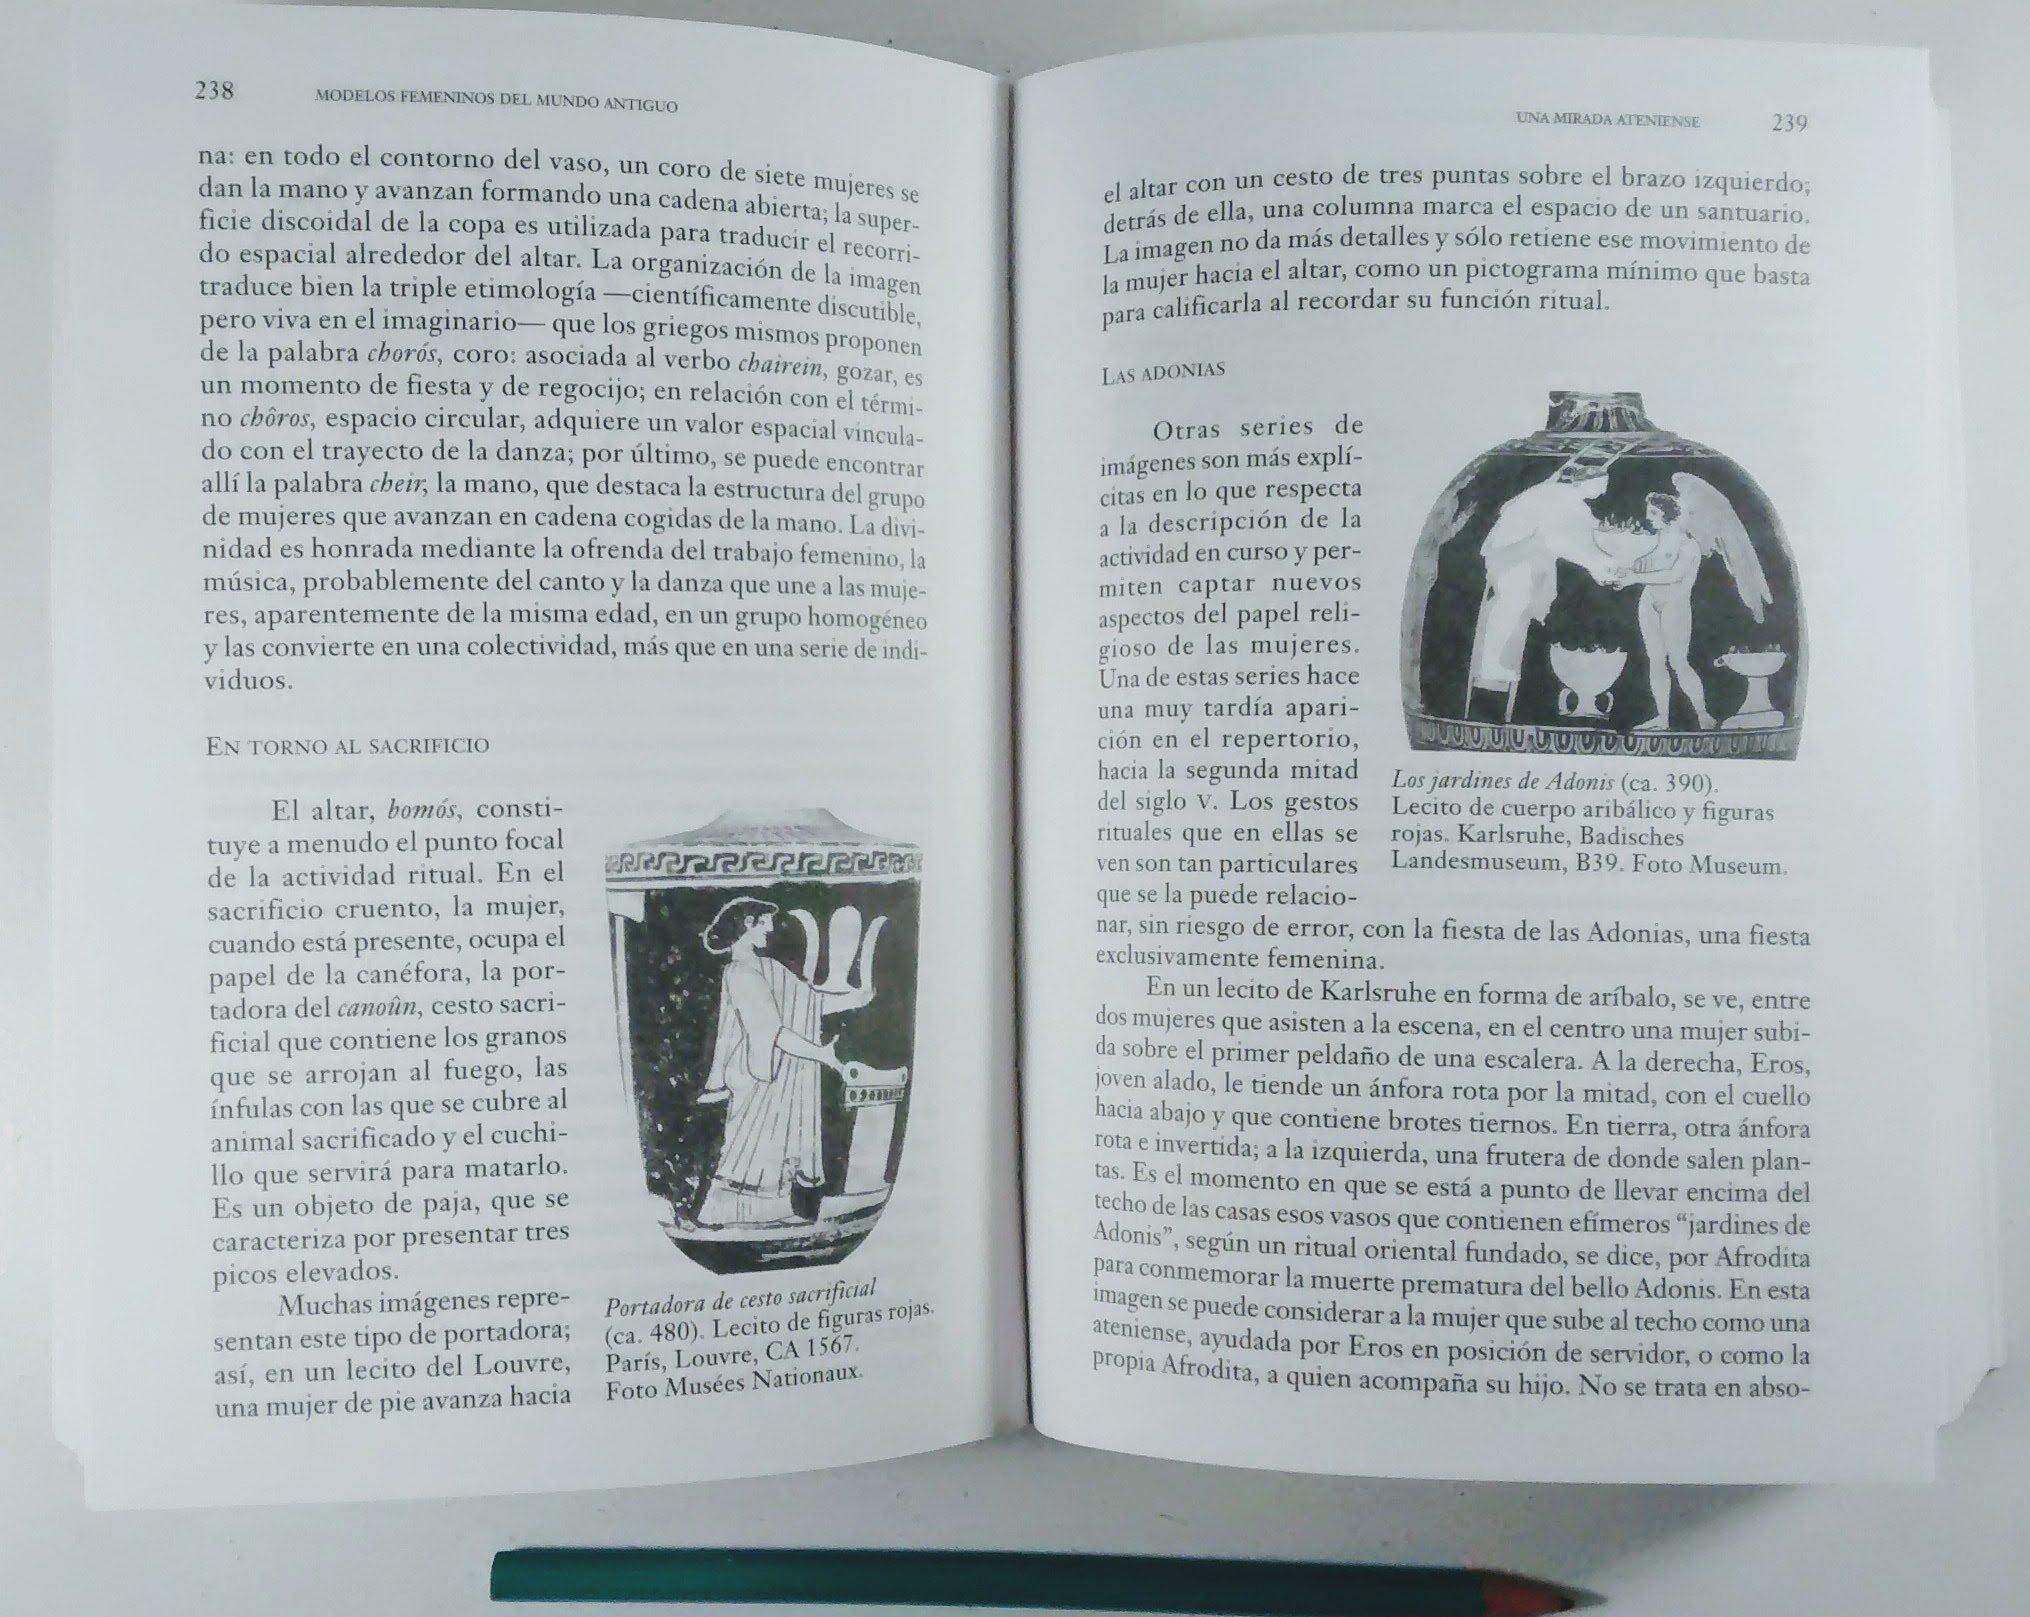 HISTORIA DE LAS MUJERES I-V ESTUCHE - MINOR (Taurus Minor ...